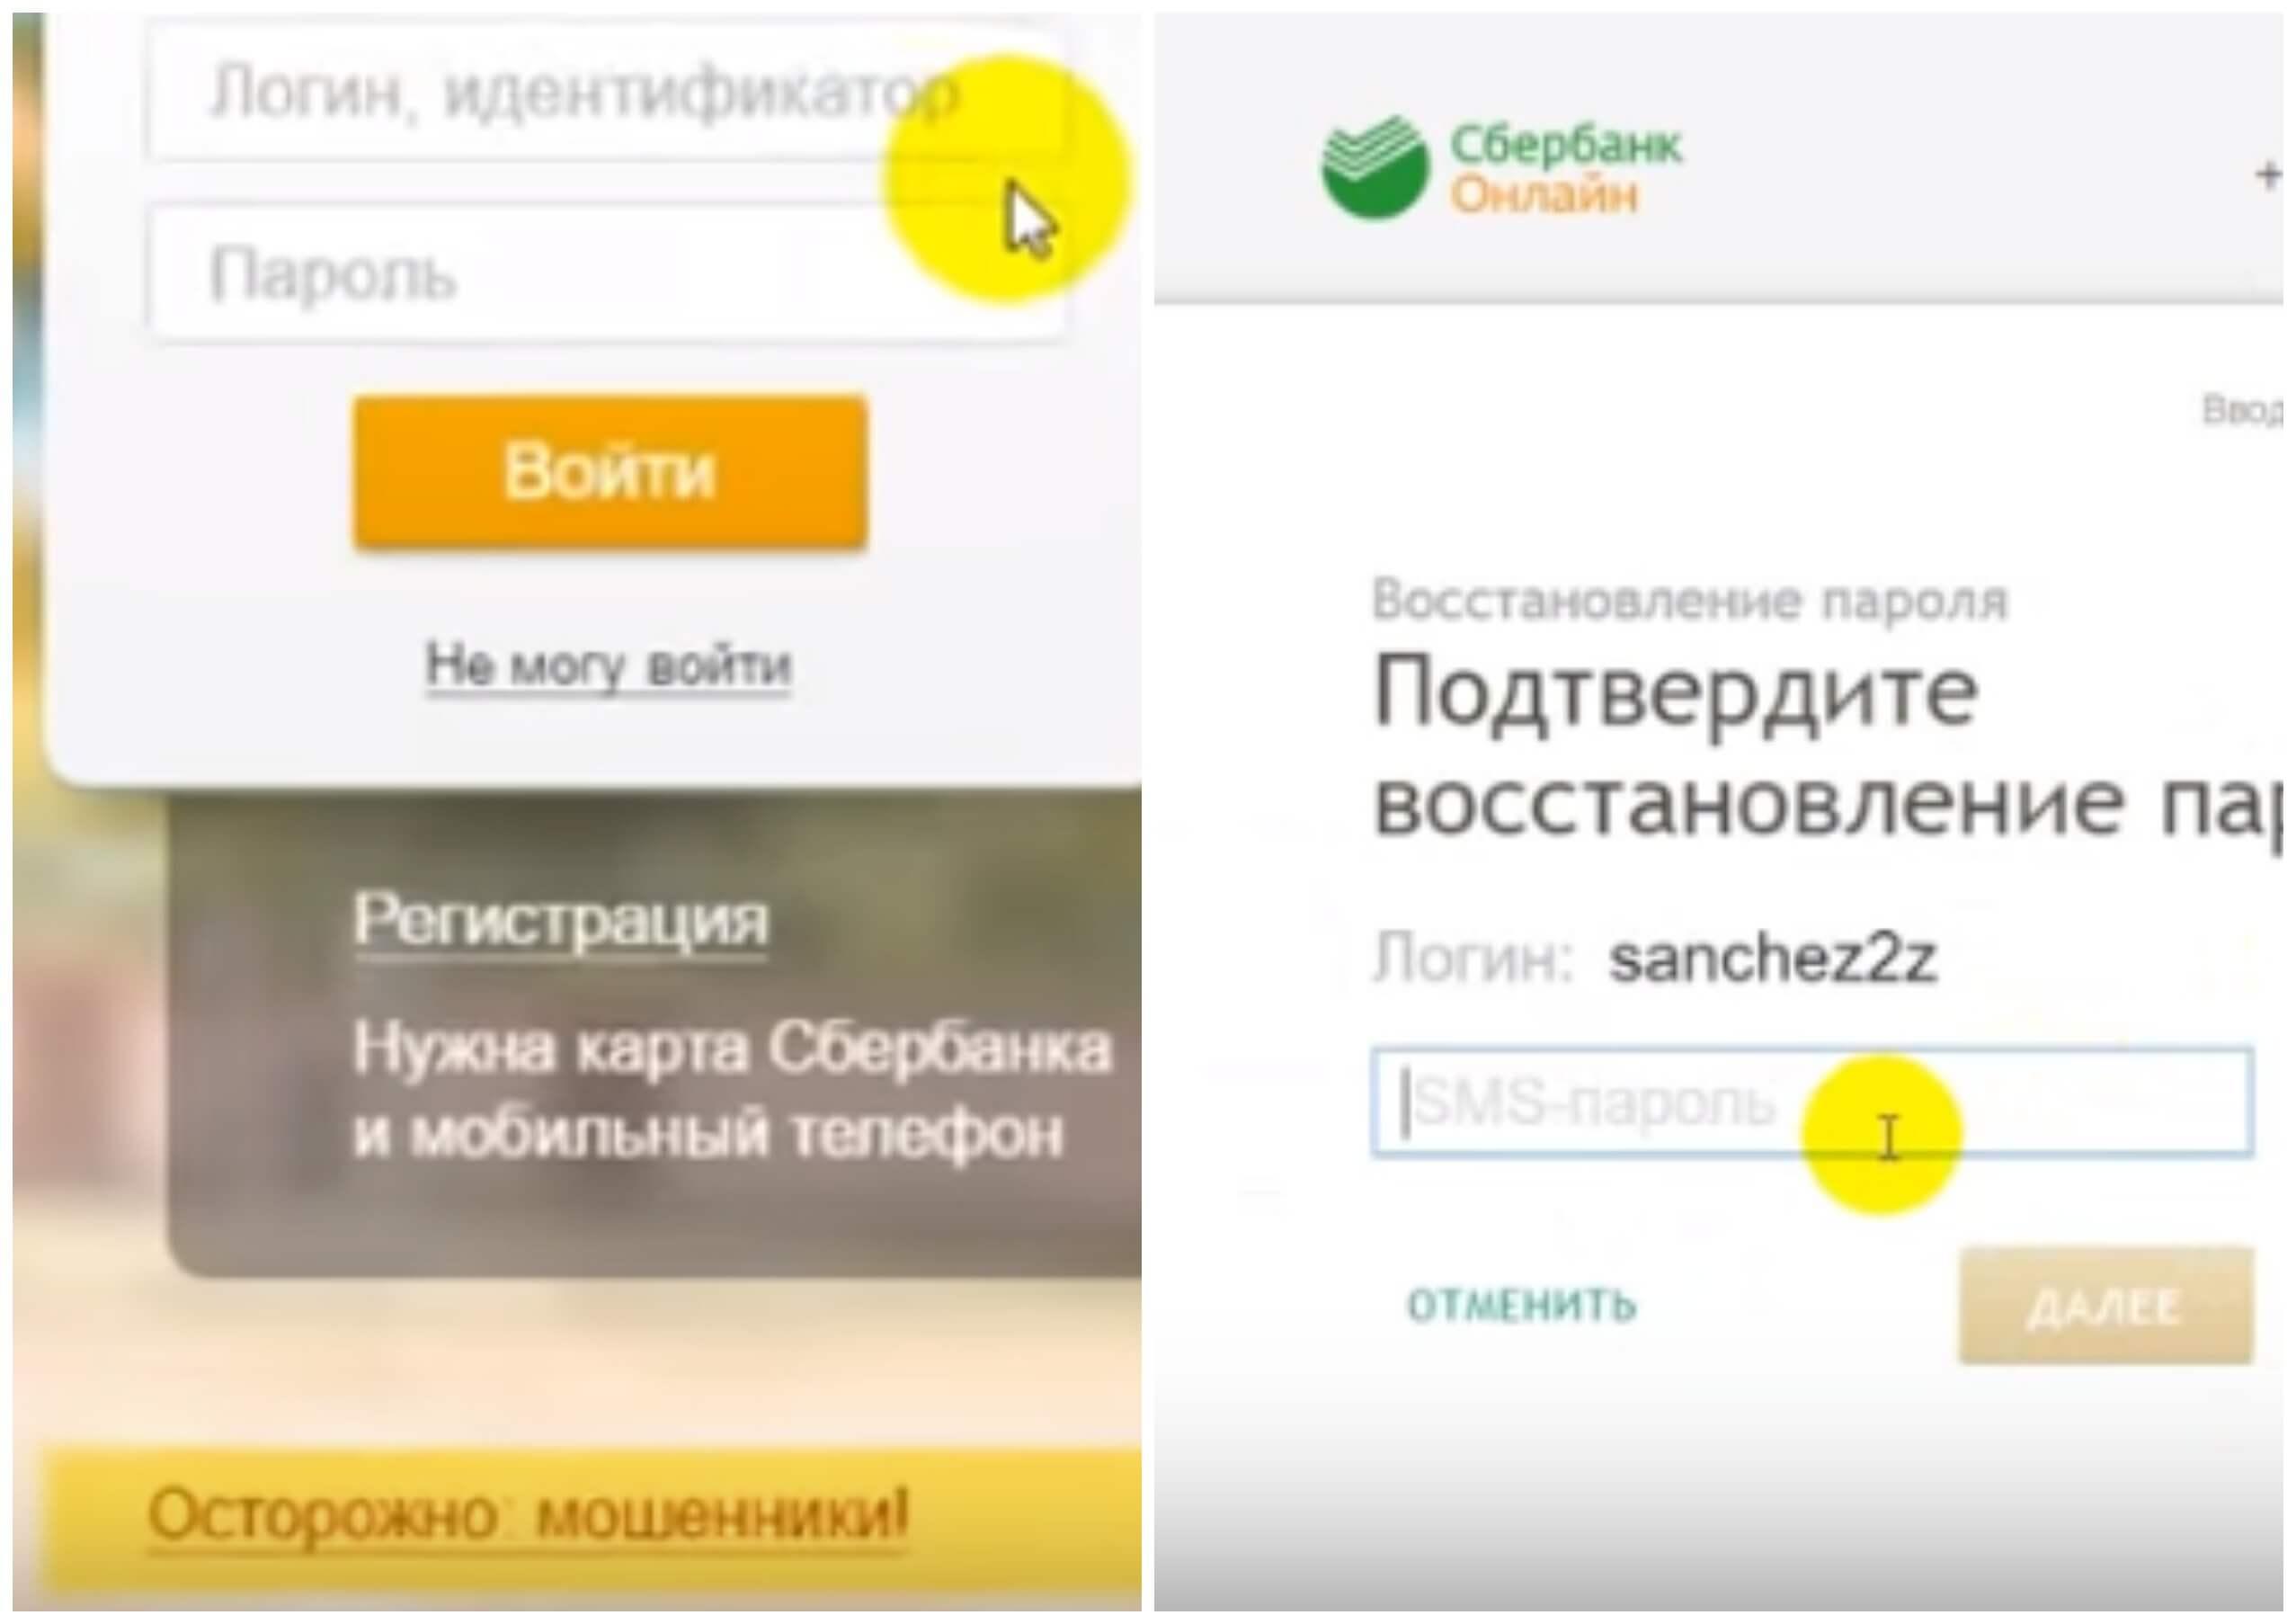 На фото изображено восстановление пароля для Сбербанк онлайн.